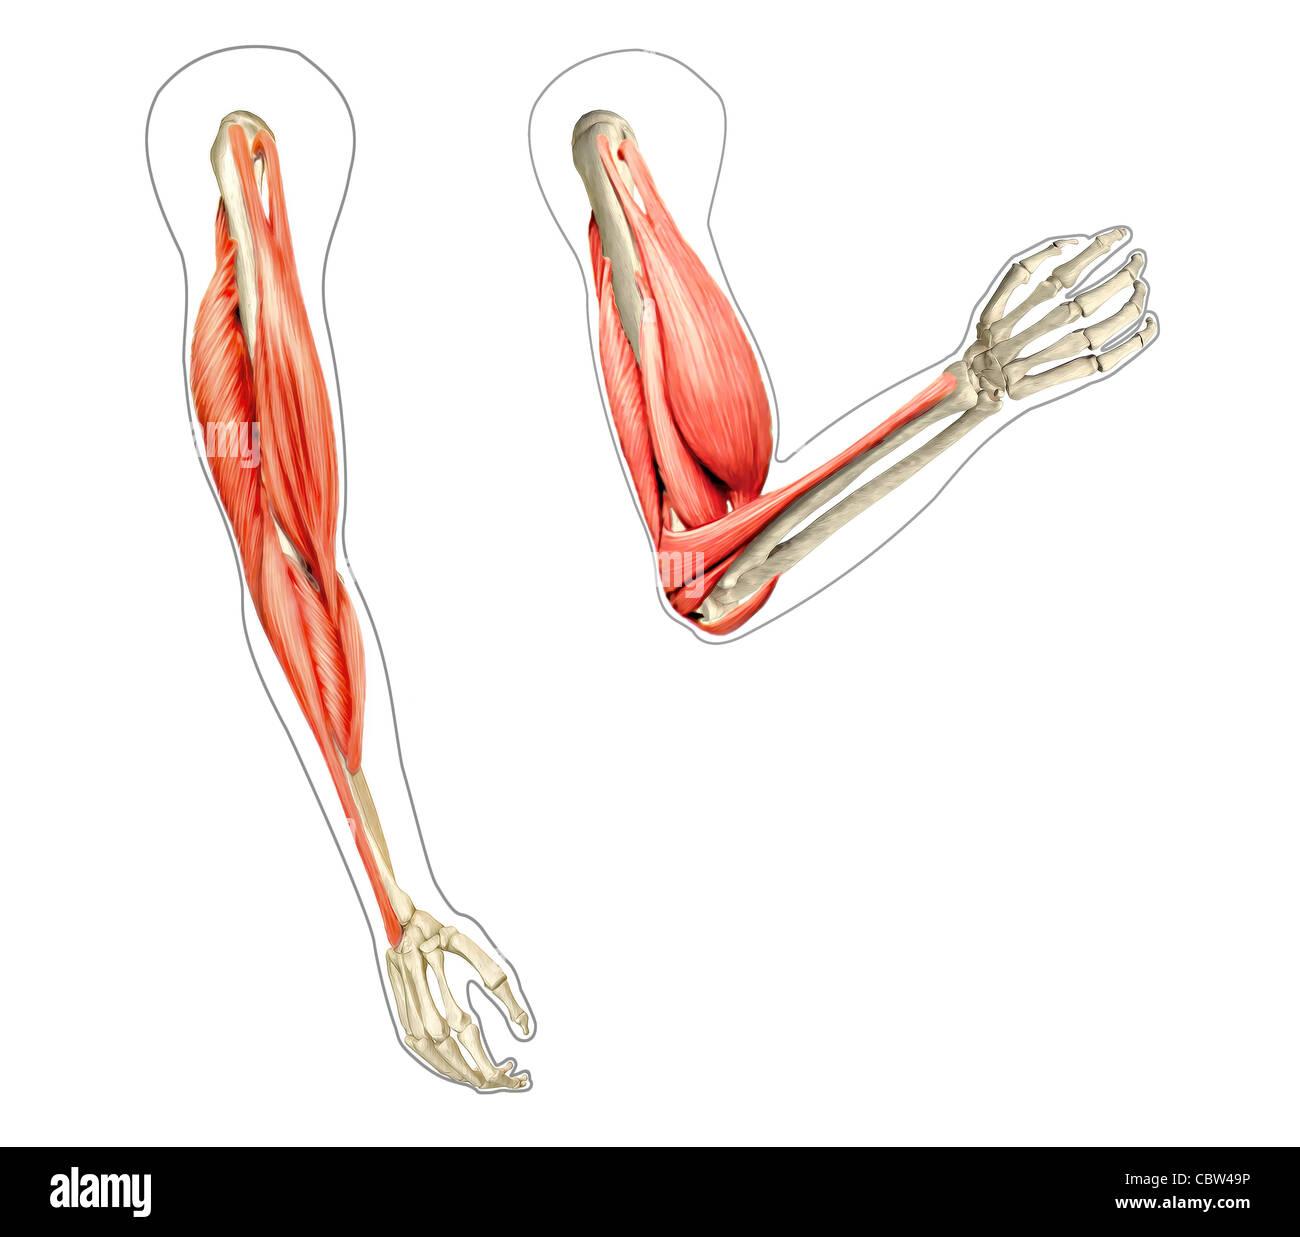 Biceps Tendon Imágenes De Stock & Biceps Tendon Fotos De Stock - Alamy